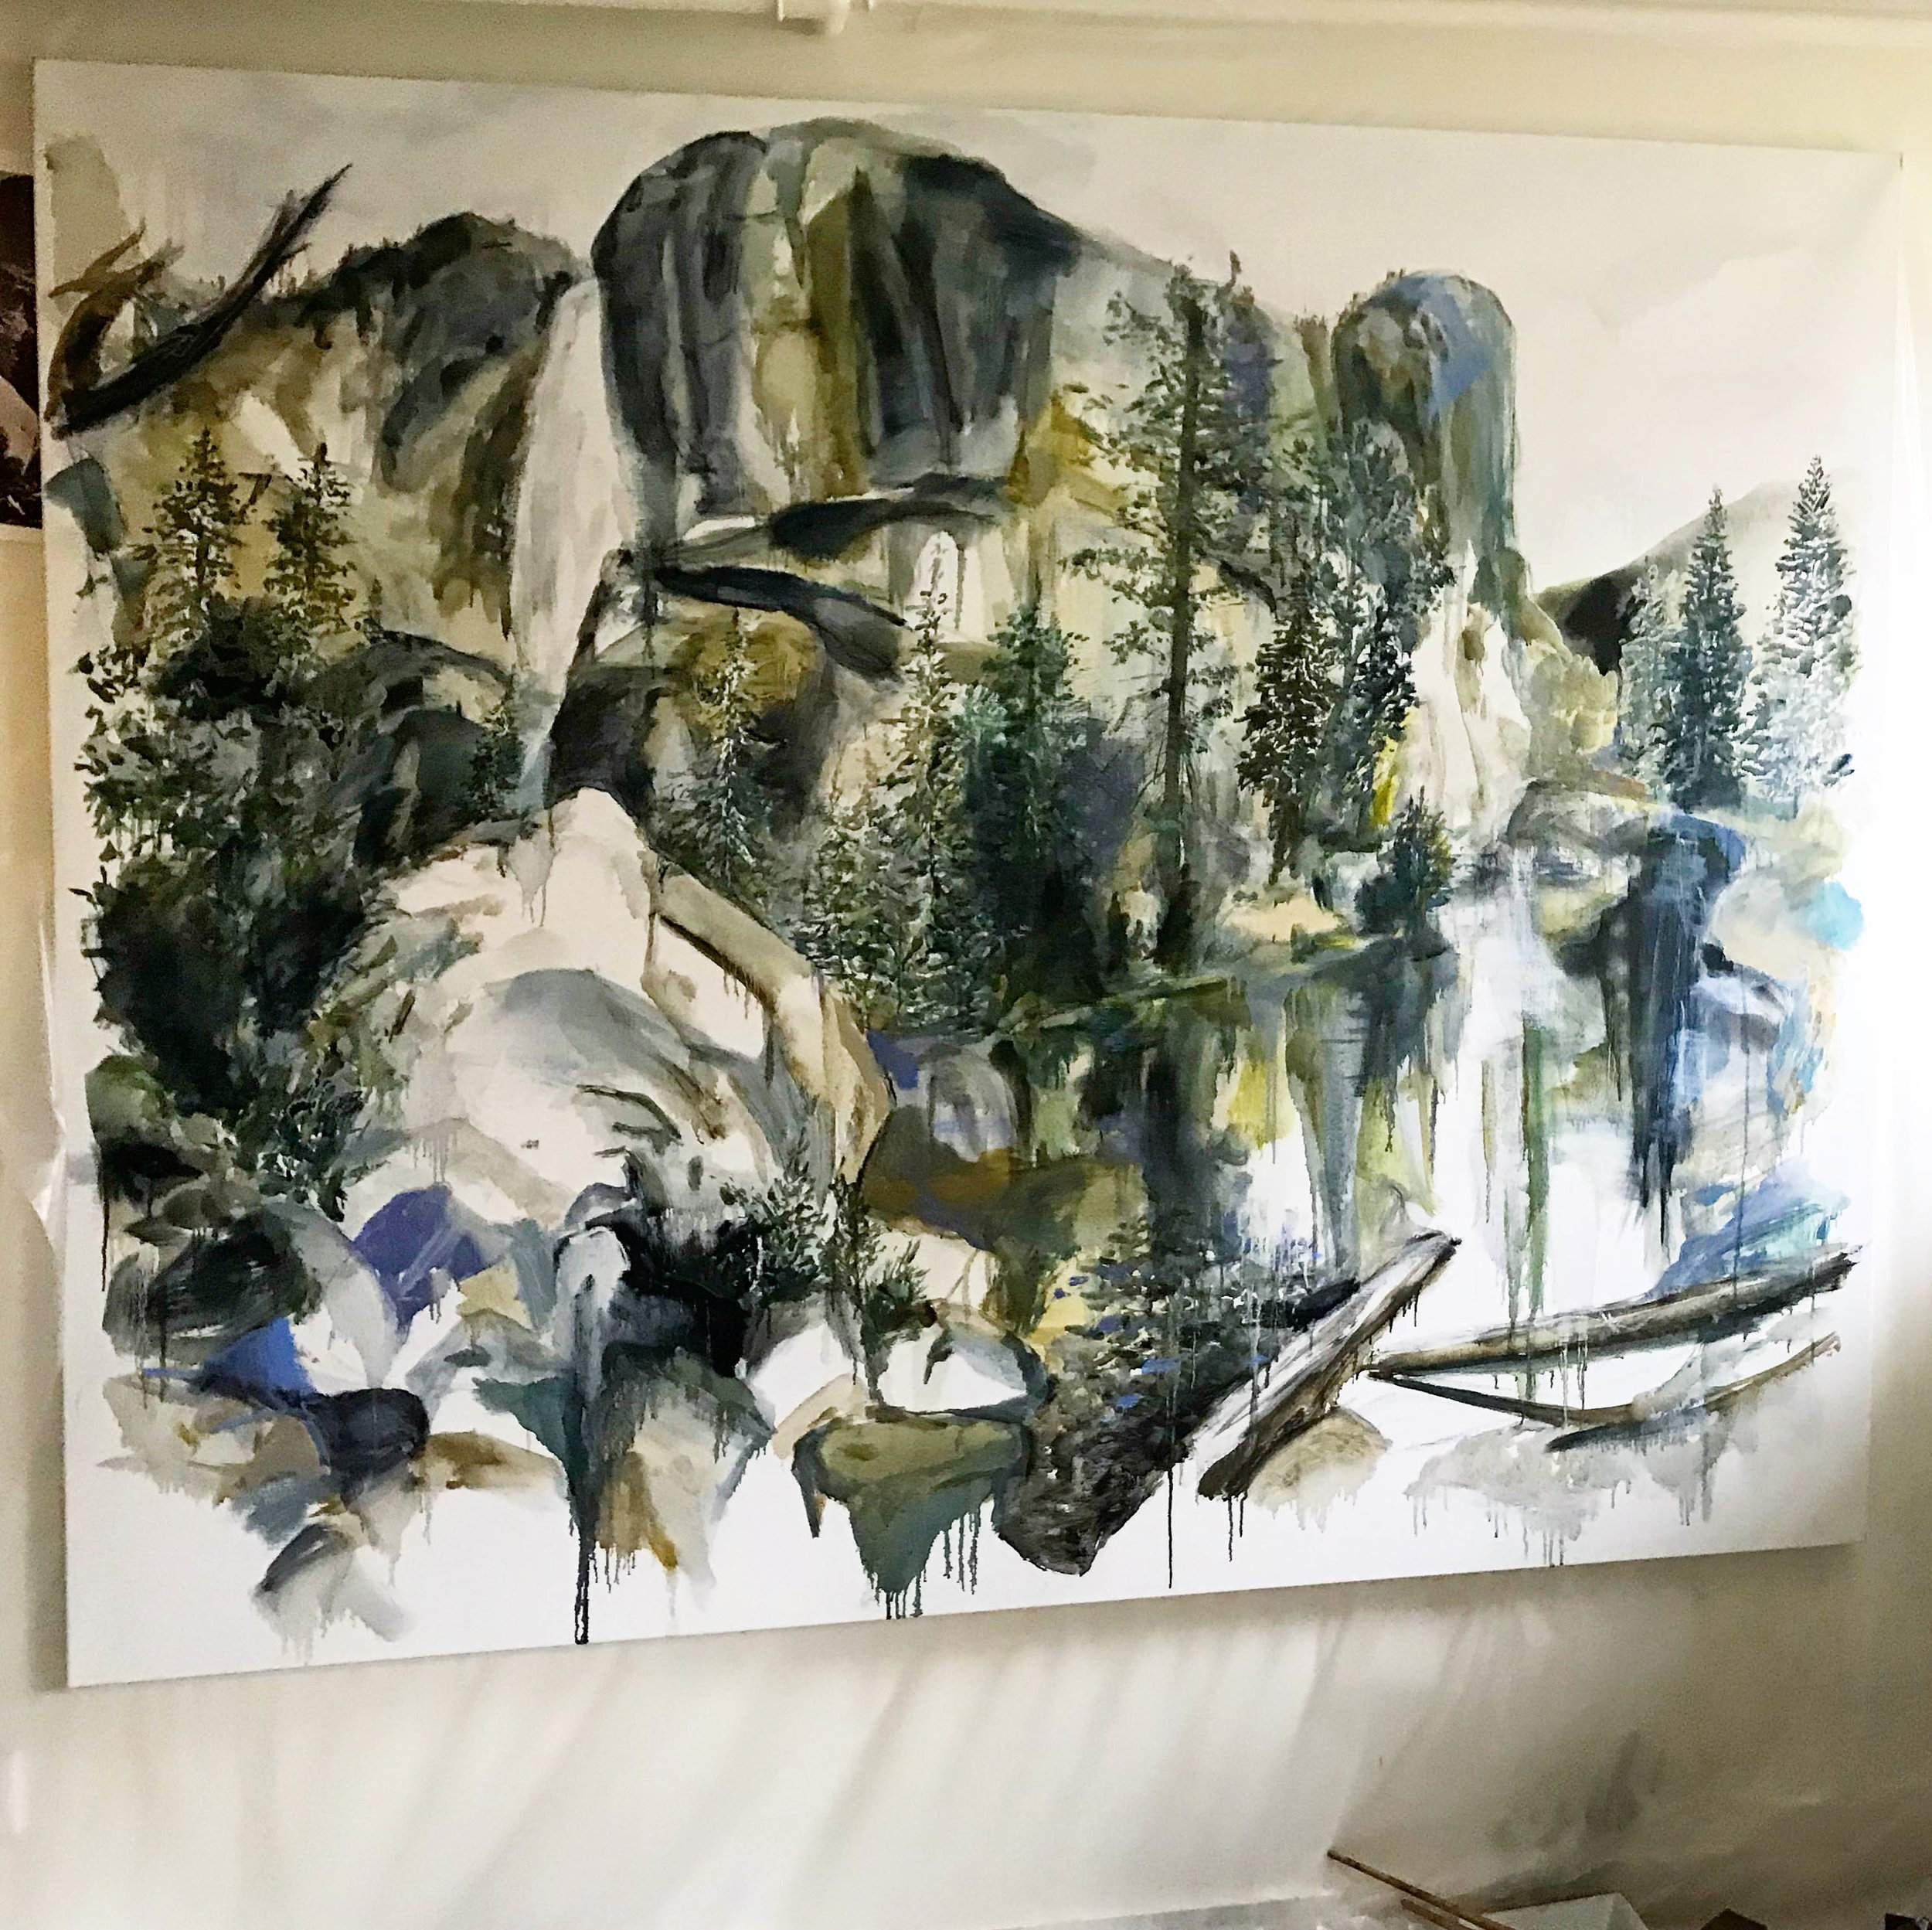 Wind, Water, Rocks II , 2018 after Carleton Watkins oil on canvas 150 x 180 cm  studio view